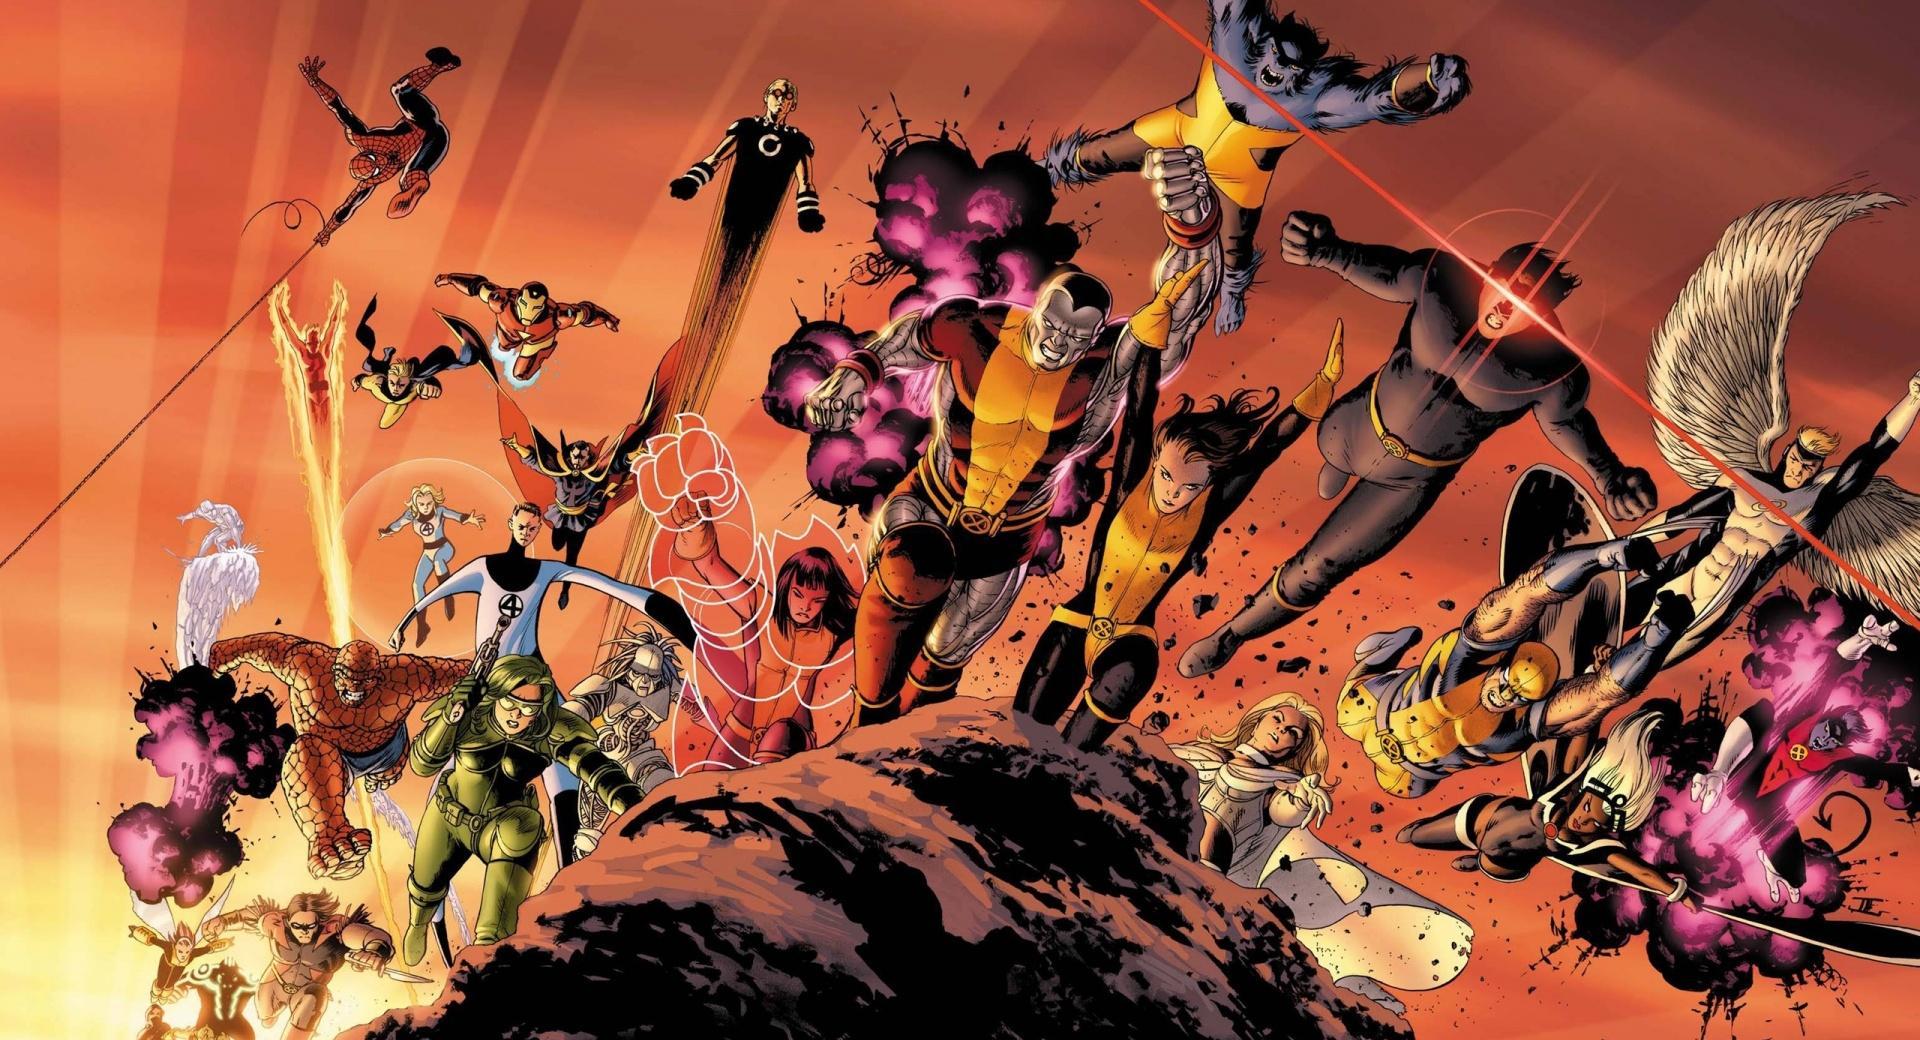 Superheroes Cartoons wallpapers HD quality